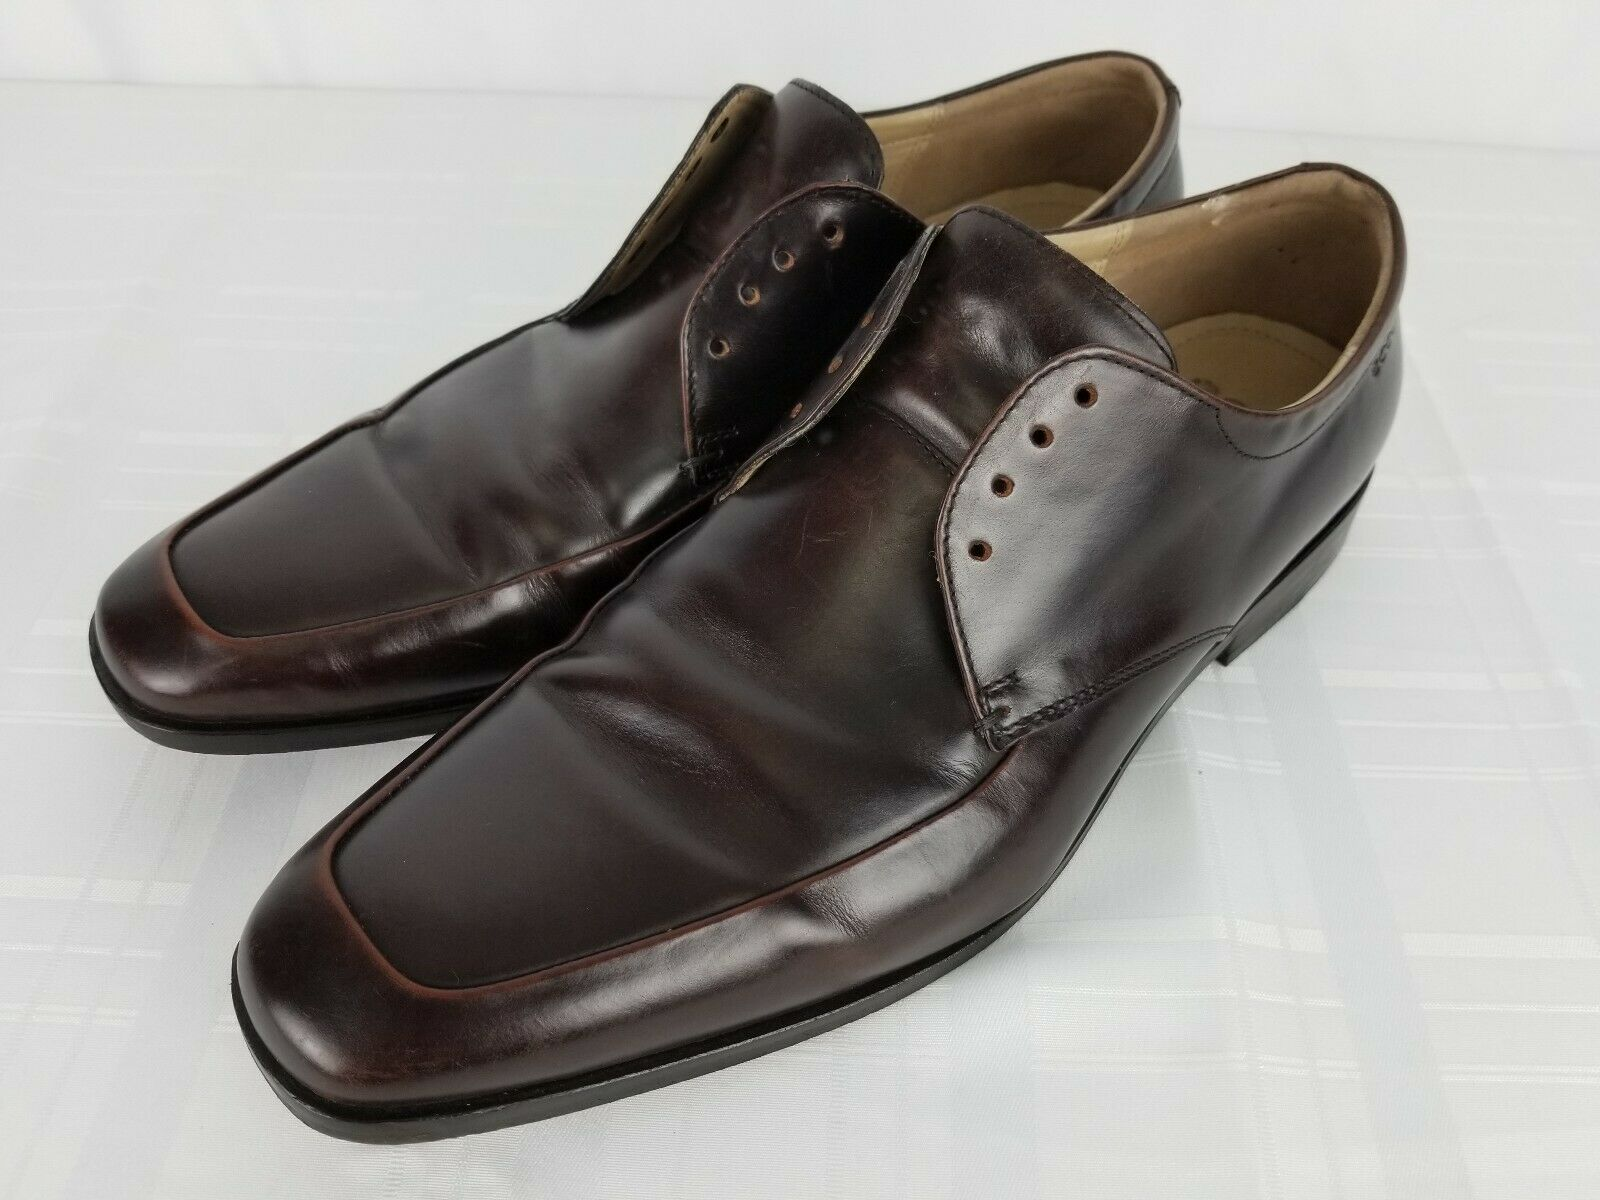 Ecco Dacono Mens Marronee Leather Square Toe Lace Up Oxford sautope Sz 45 US 11 11.5